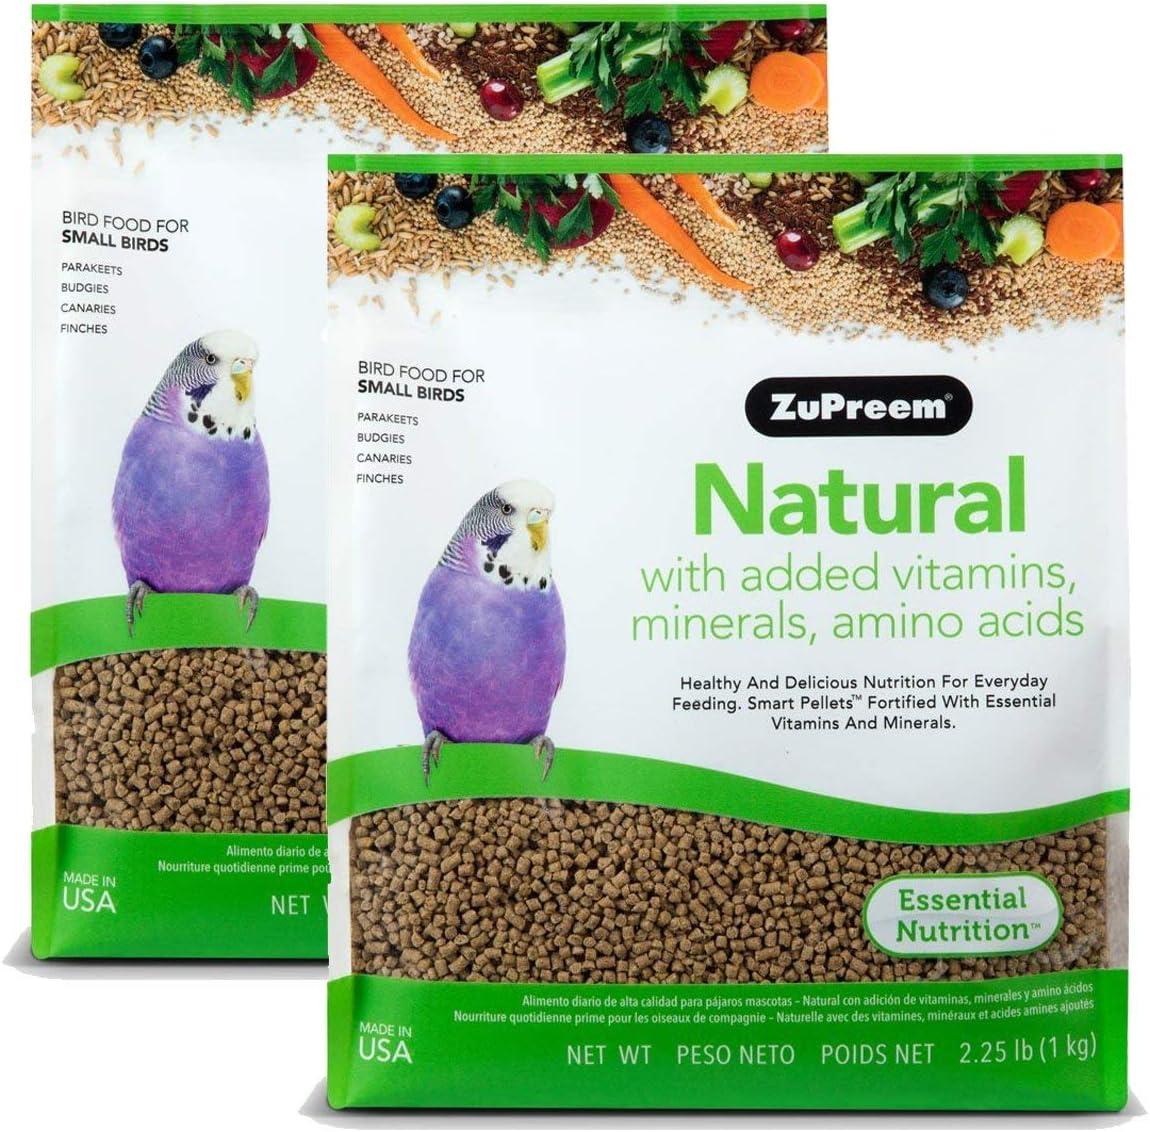 ZuPreem Natural with Added Vitamins, Minerals, Amino Acids Small Bird Food, 4.50 lb.